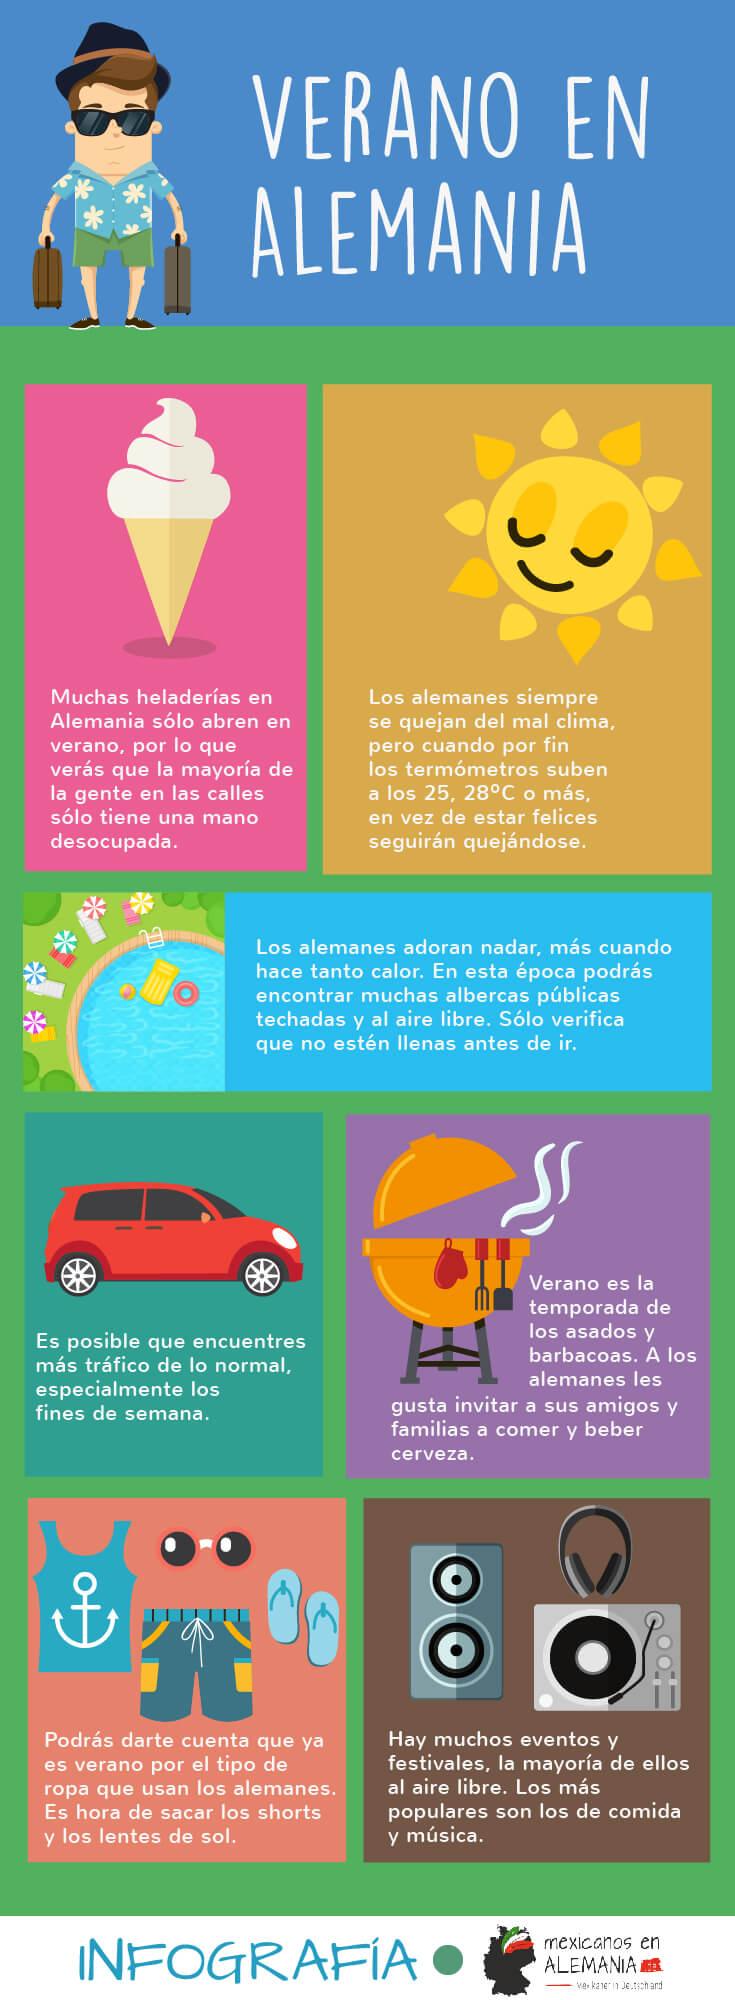 veranoenalemania-infografiaverano